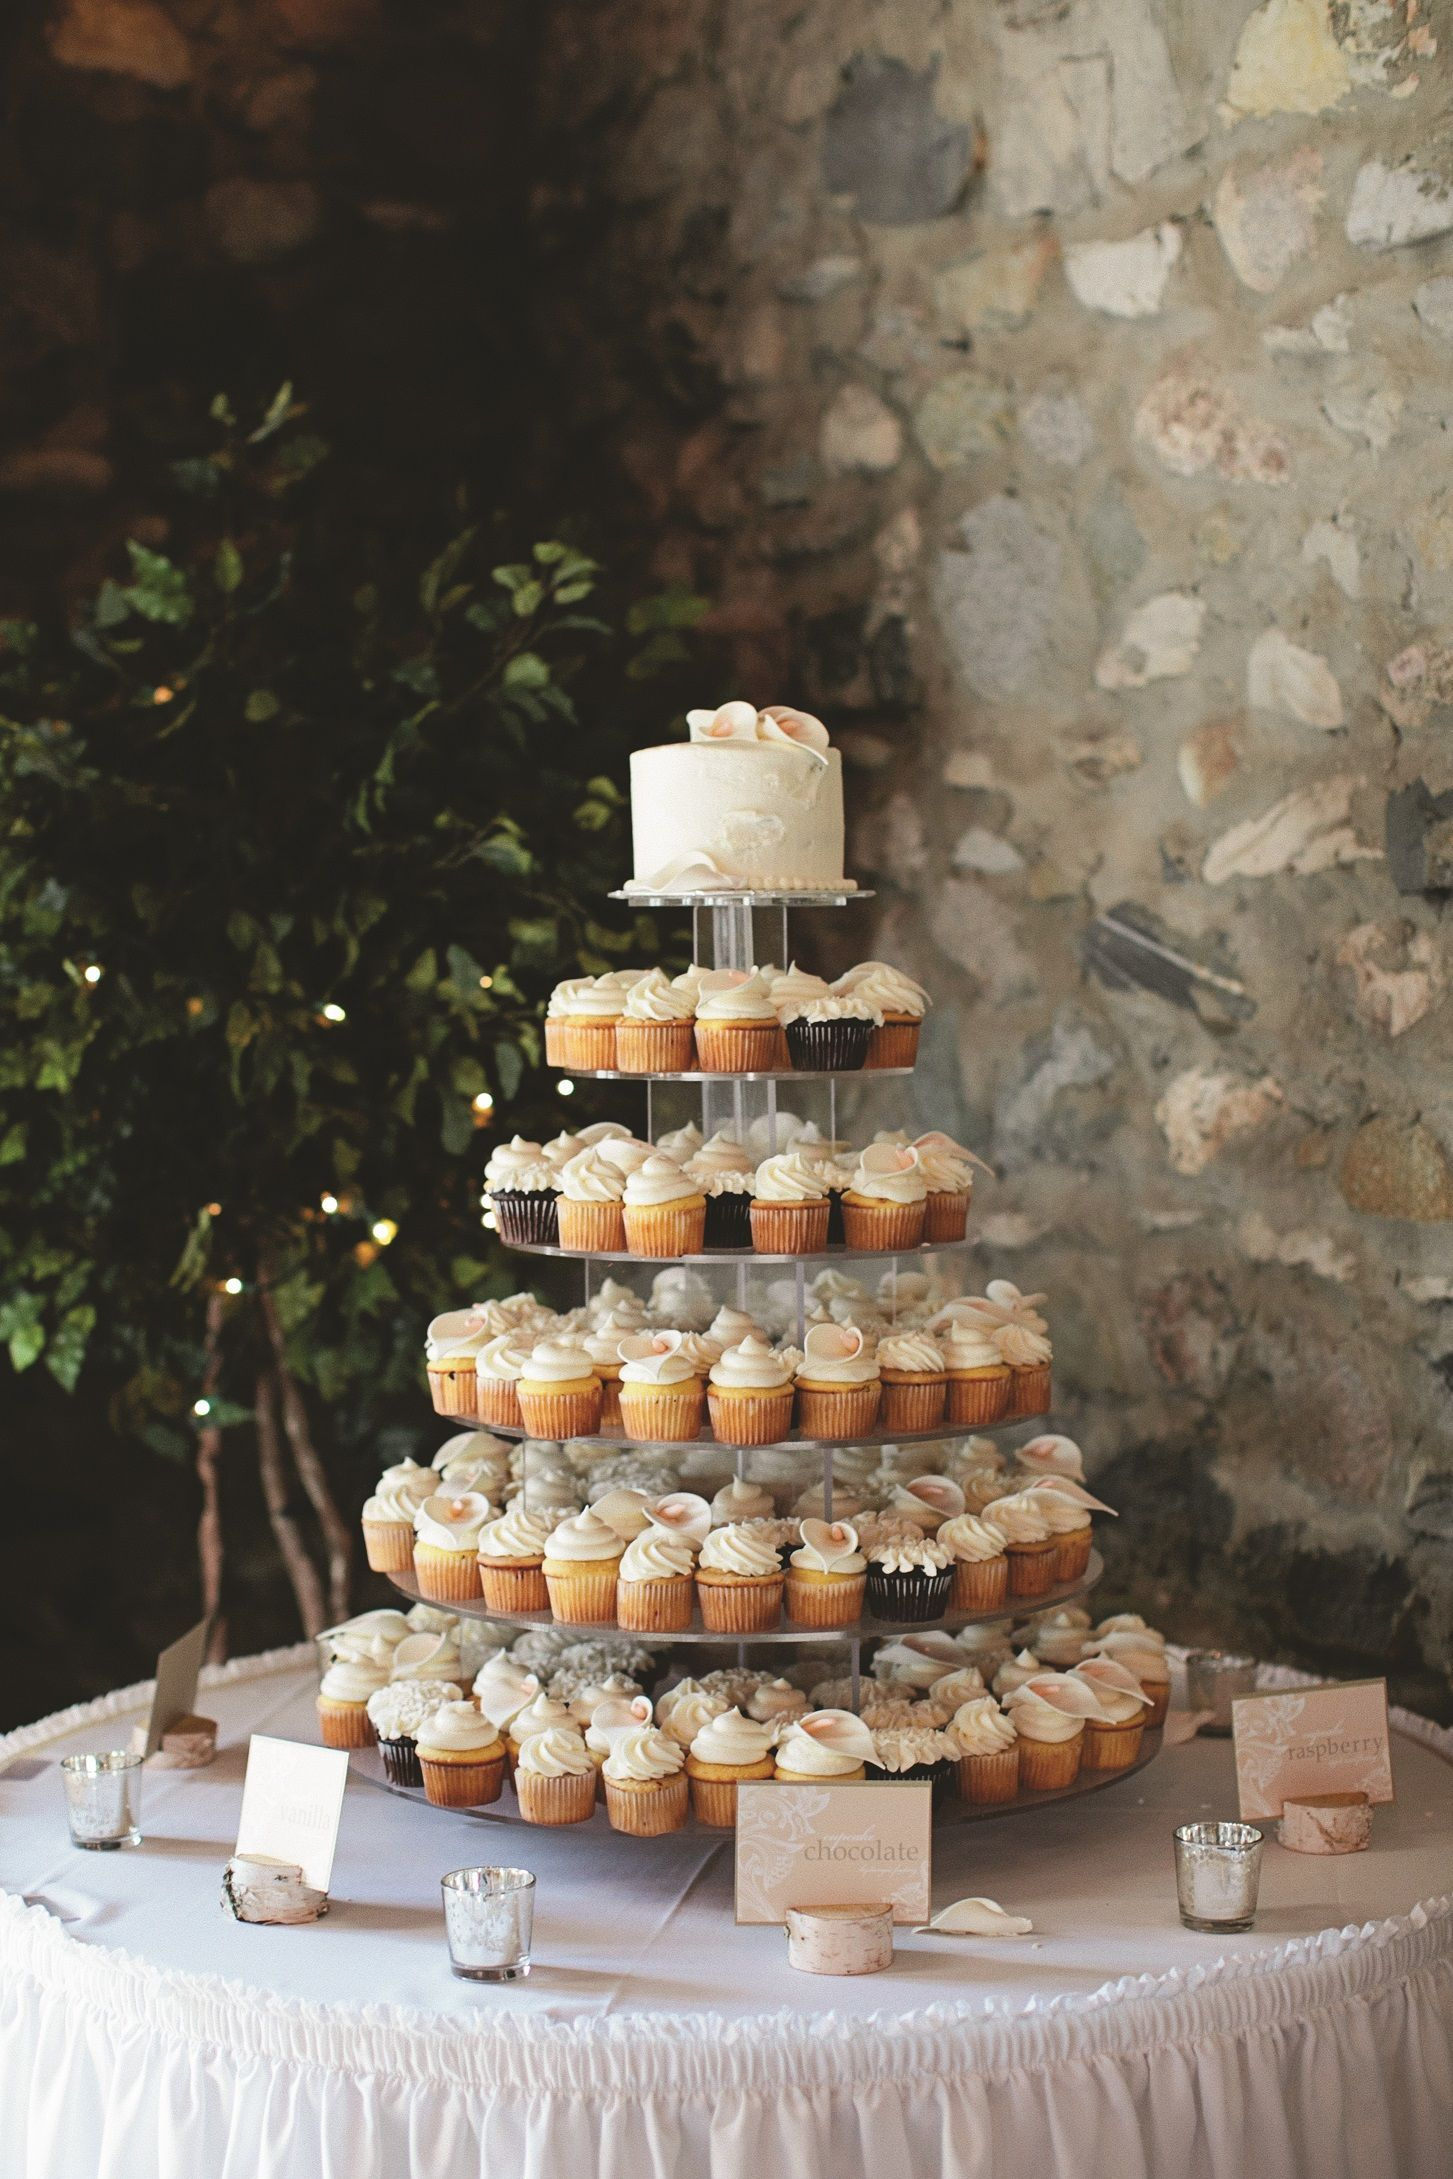 Traditional wedding decor ideas 2018  Should she go with cupcakes or a traditional wedding cake  Photo